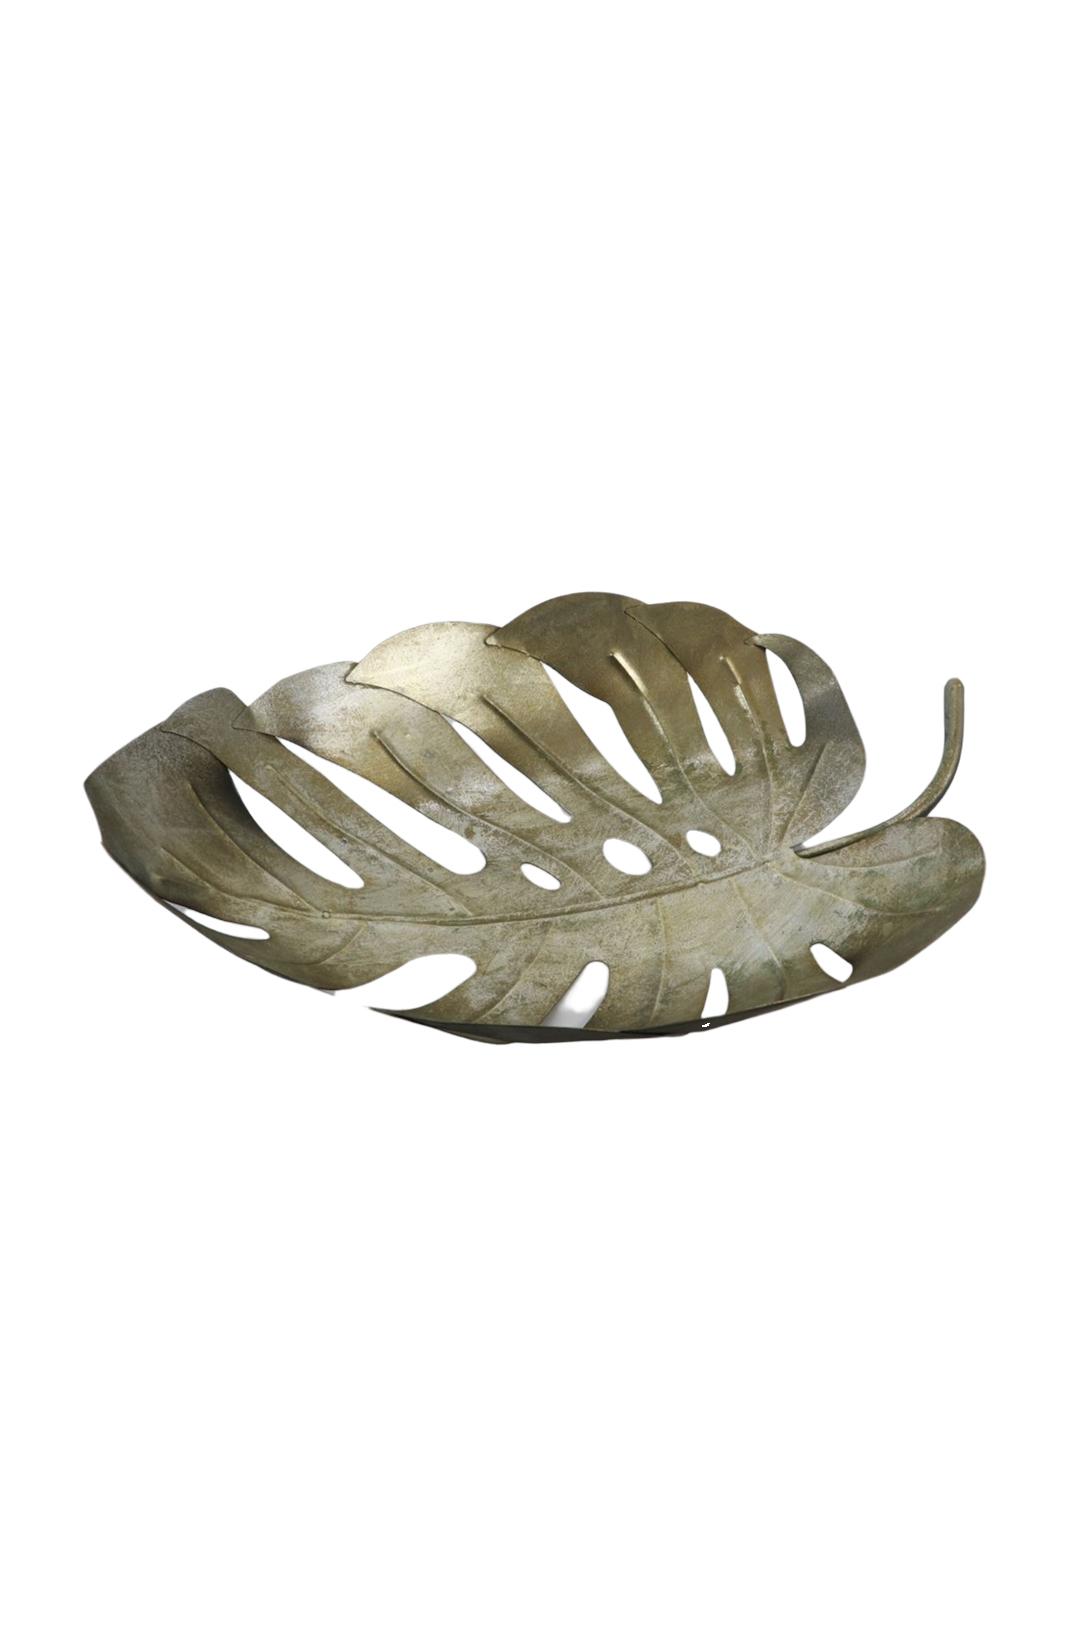 piatto, piatti, vassoio, vassoi, monstera, vassoio forma foglia, foglia, foglie, decor, decorazioni, allestimenti, wedding, allestimento